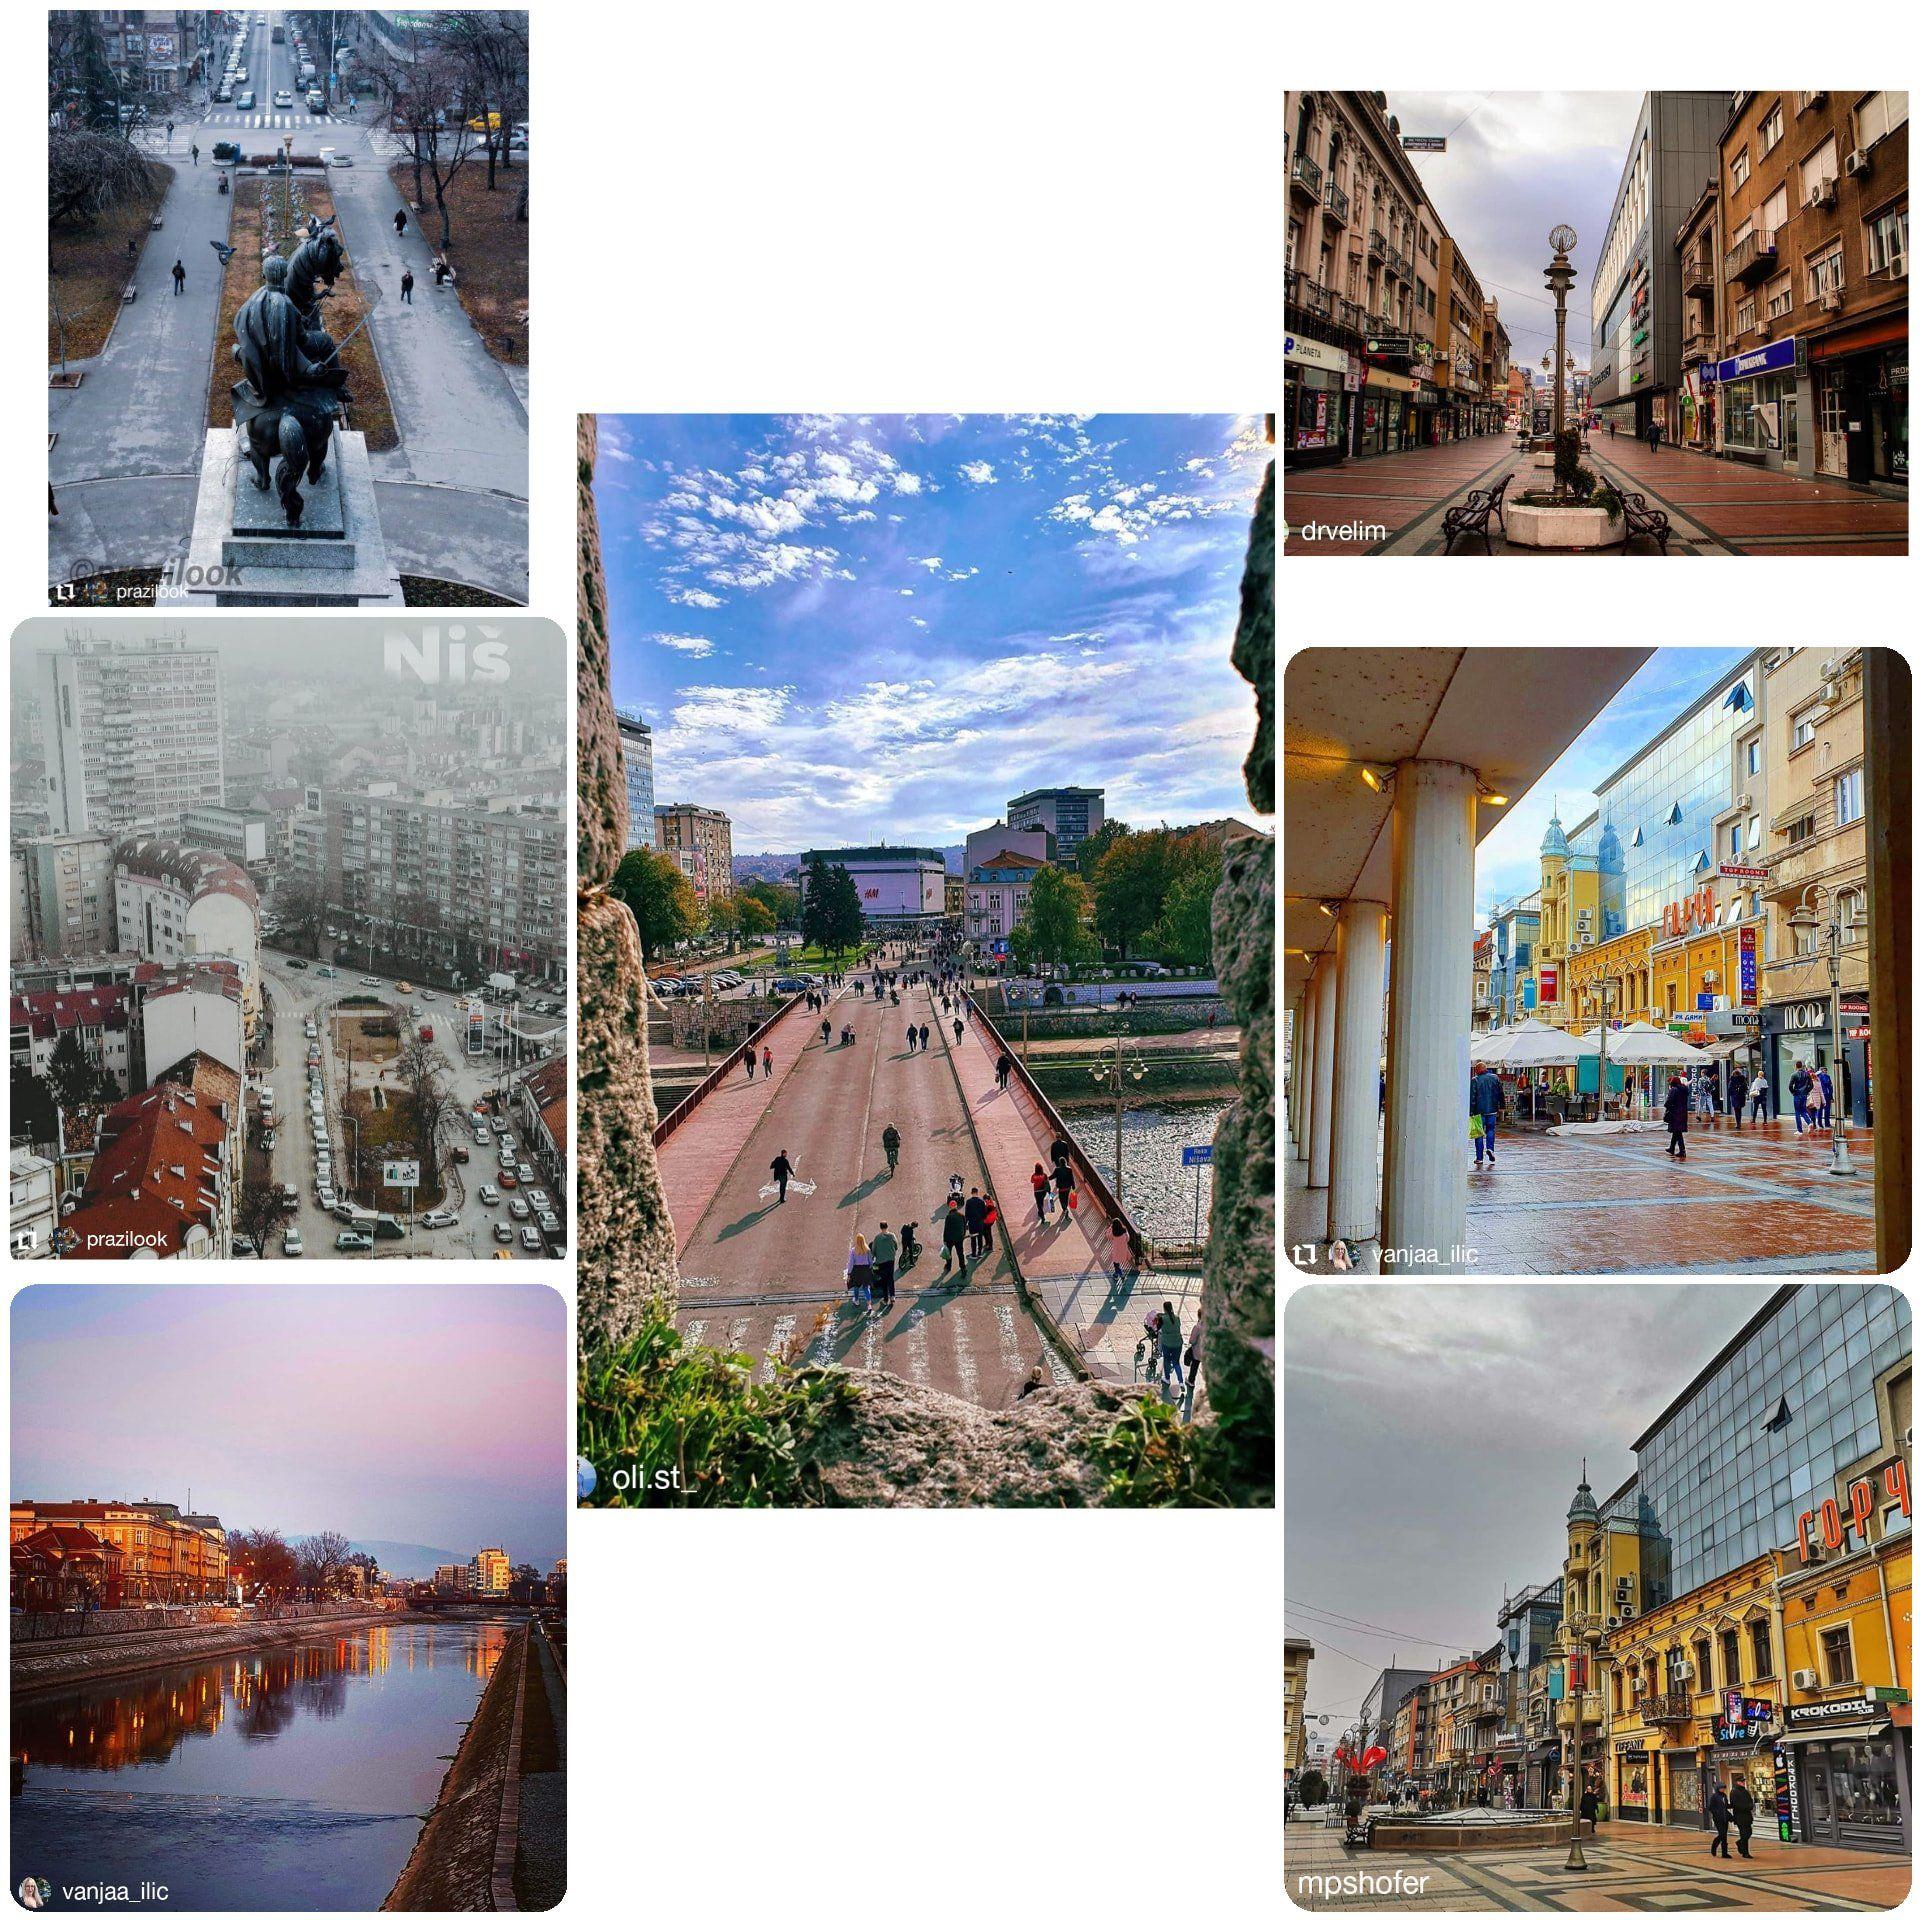 Fotografije su delo @prazilook @vanjaa_ilic @oli.st_ @drvelim @mpshofer . #gradnis #citybestpics #clickcat #picoftheday #streetphotography #artsofvisuals #photooftheday #street_photography #photography #wanderlust #passionpassport #ig_captures #worldshotz #fotografia #visitserbia #visitnis #instagood #travelers #nish_be #monuments #droneshots #map_of_europe #streets_of_our_world #citykillerz #streets #riverside #nisava